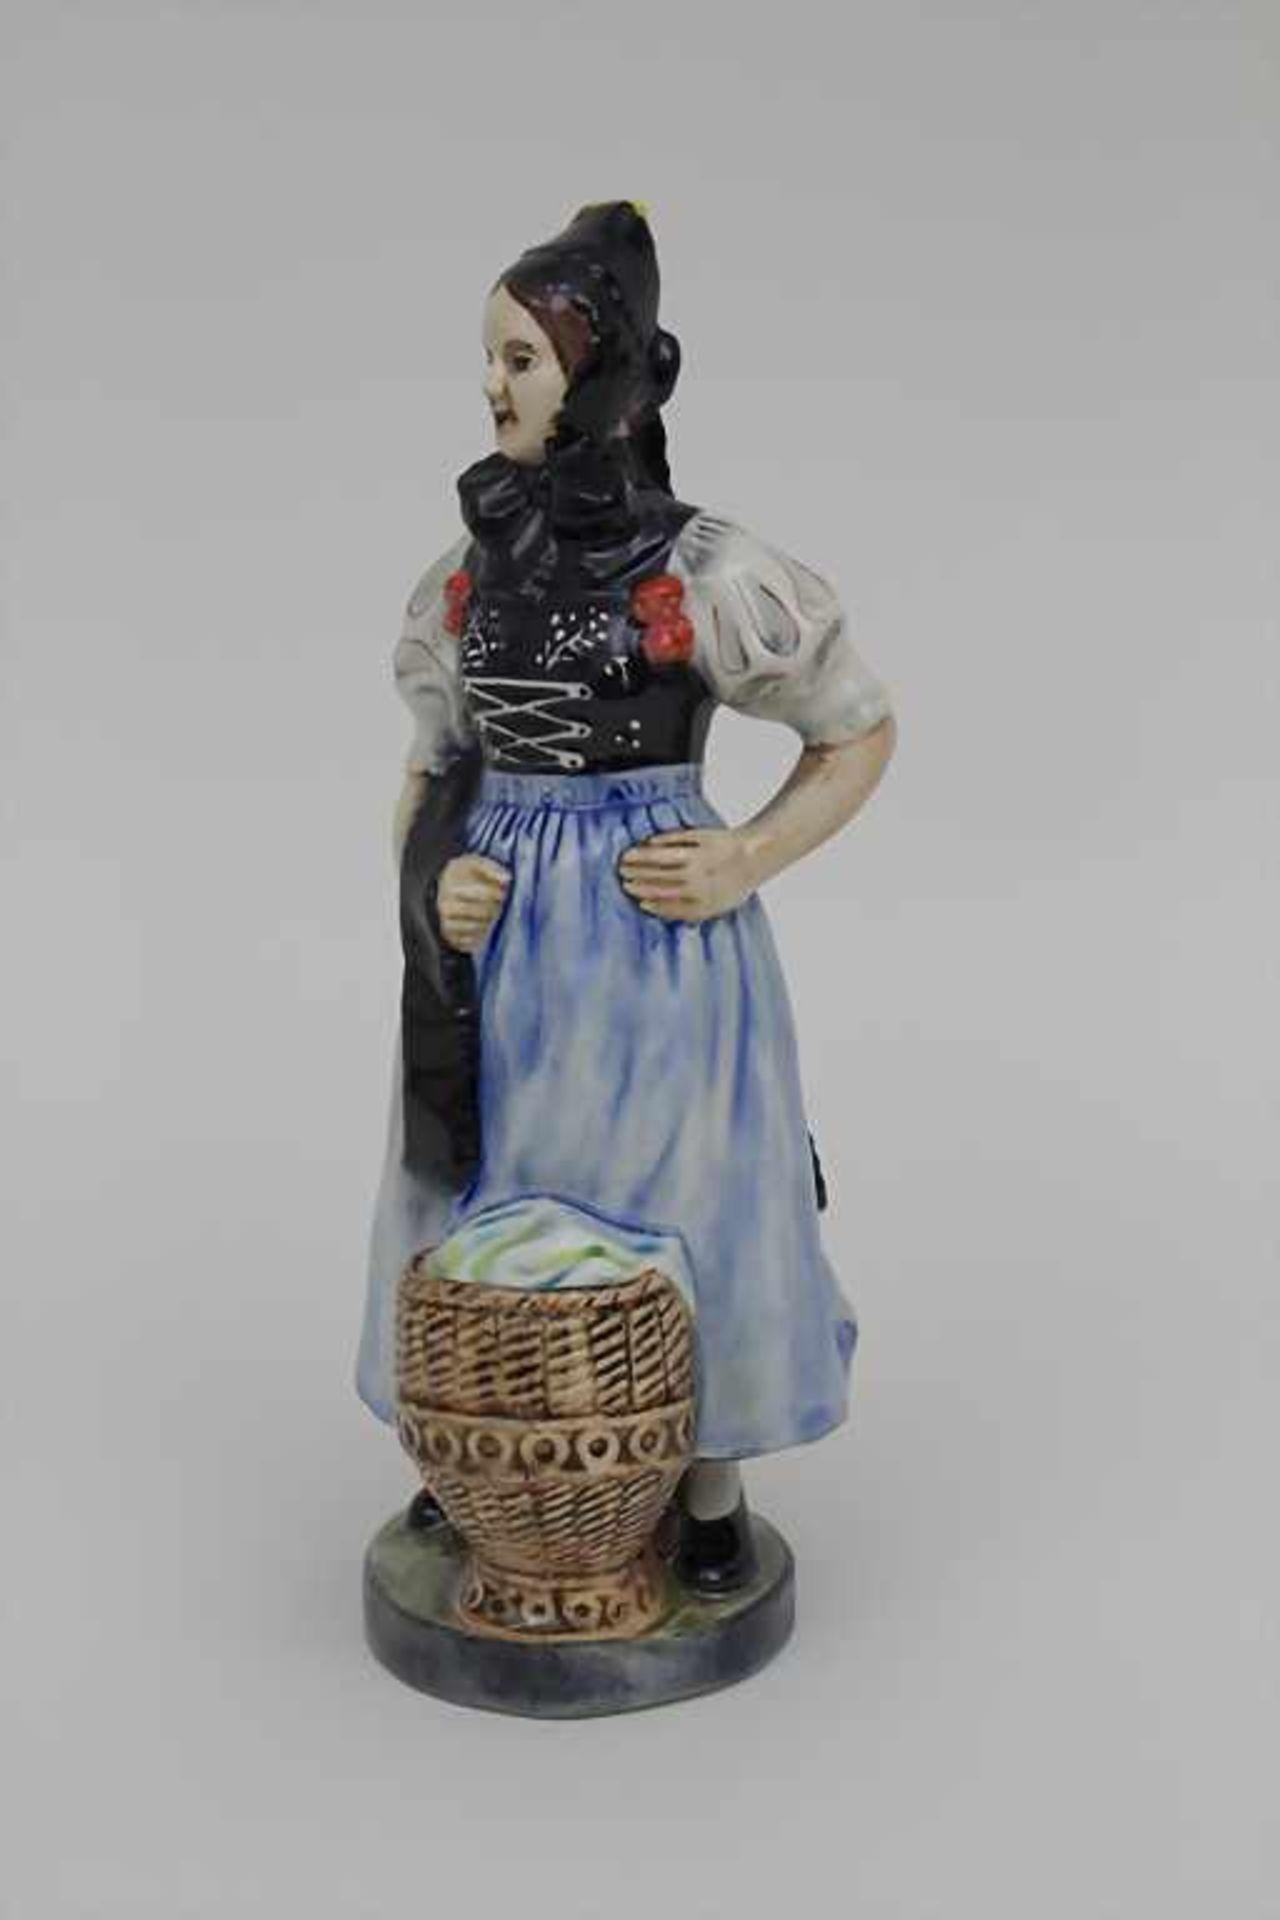 Trachtenfigur 'Tribergerin' / A costumed woman from the Black Forest, Karlsruher Majolika, um 1940 - Bild 3 aus 4